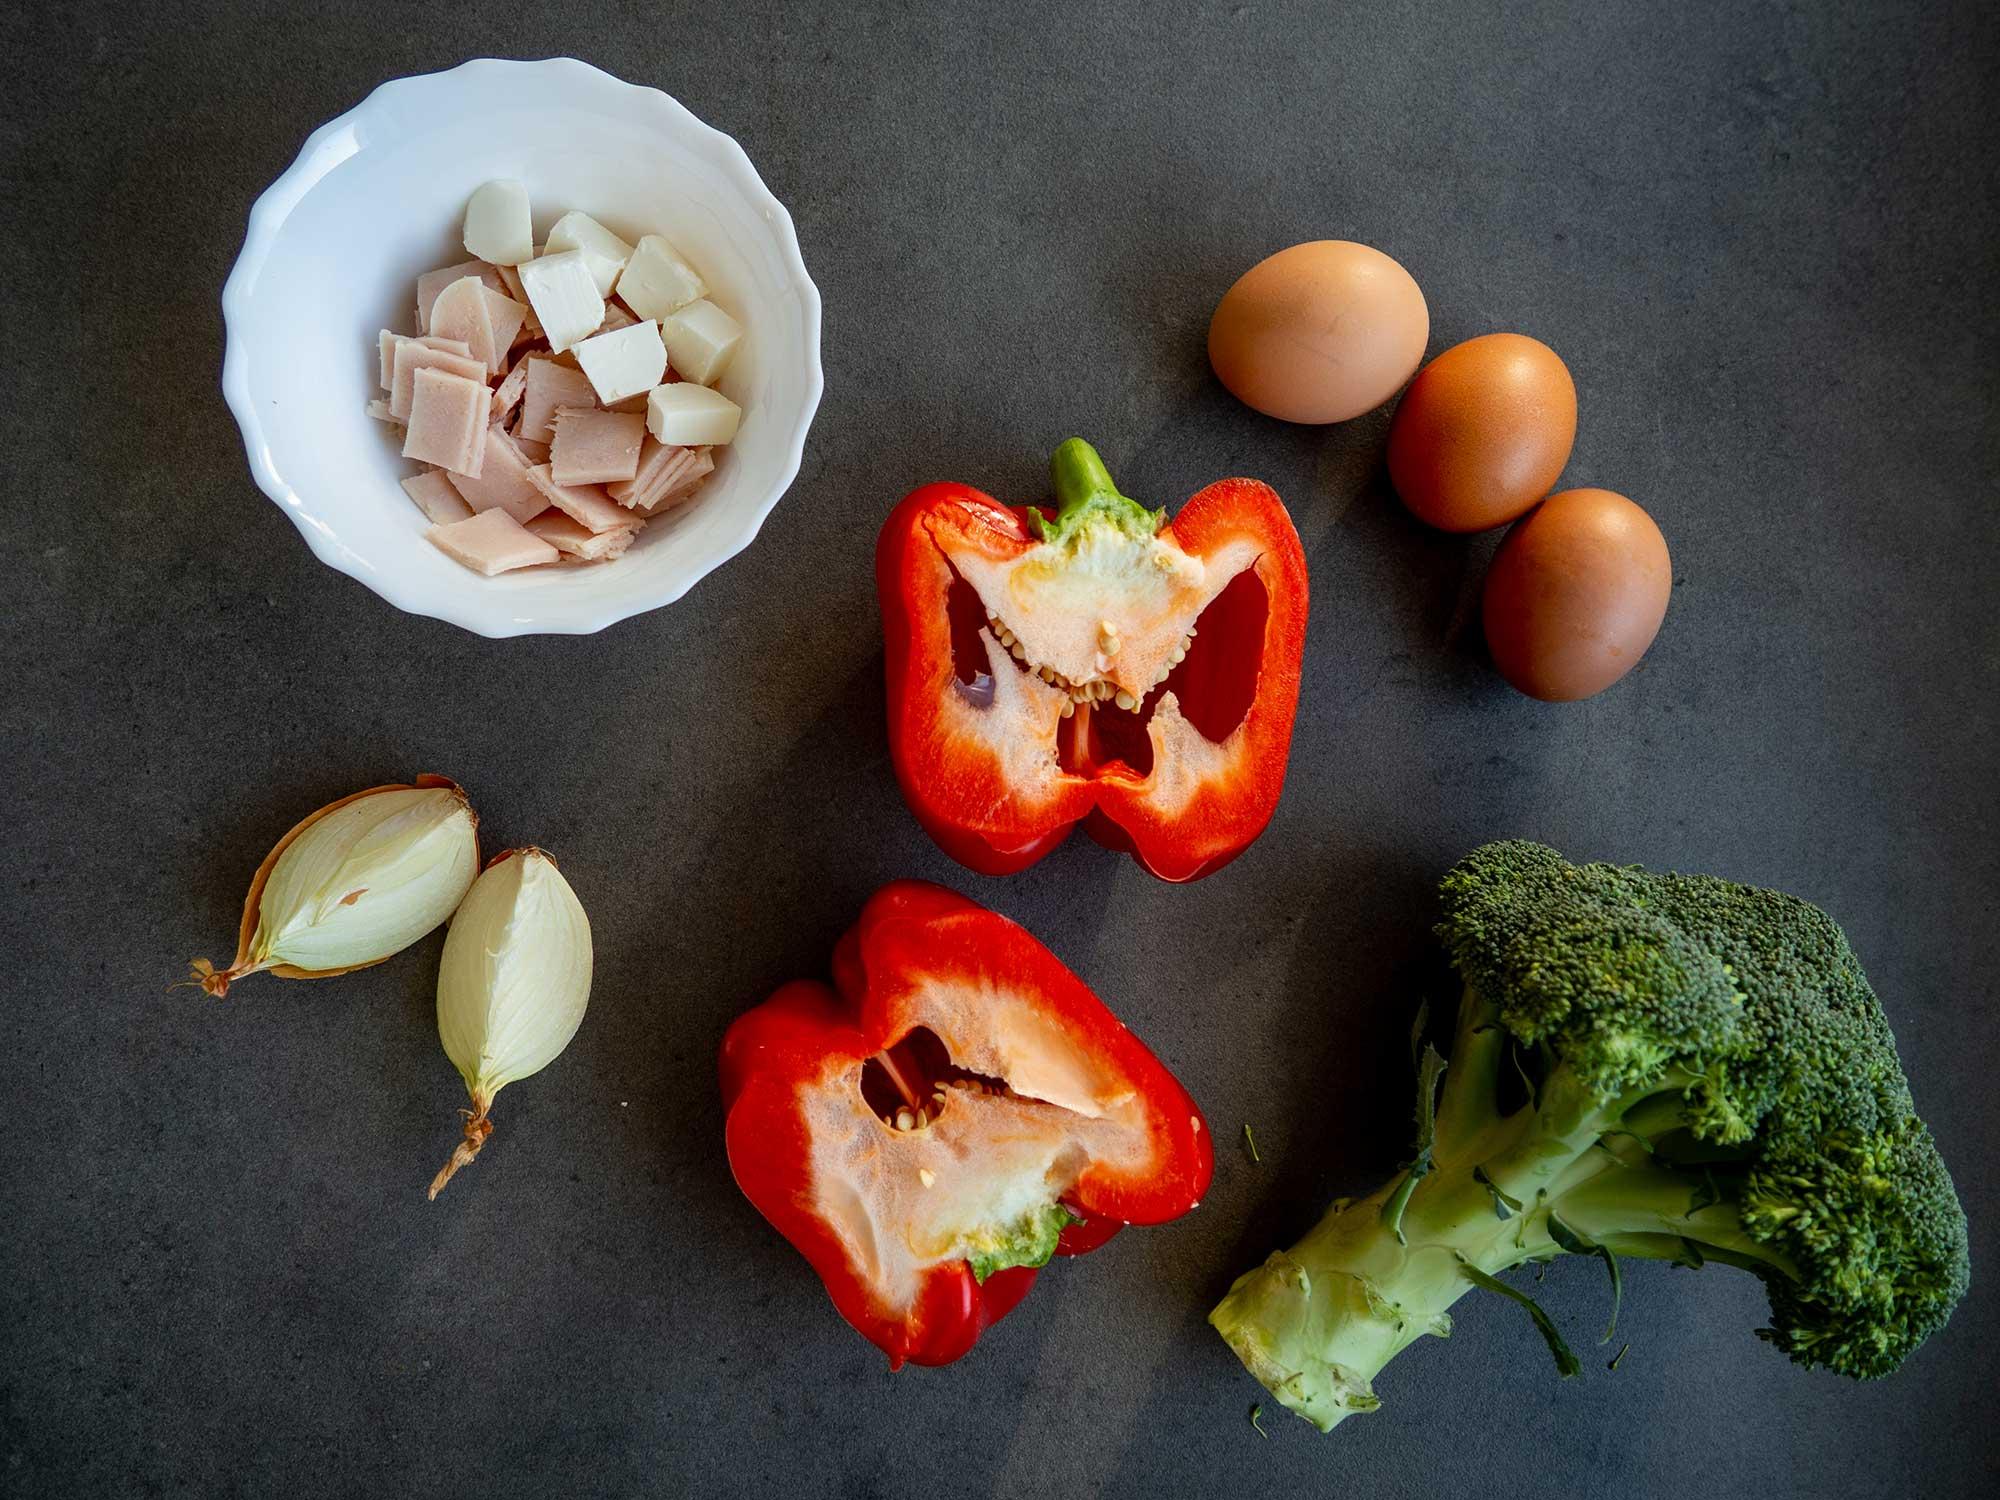 3 eggs, broccoli, red pepper, garlic, chicken breast ham